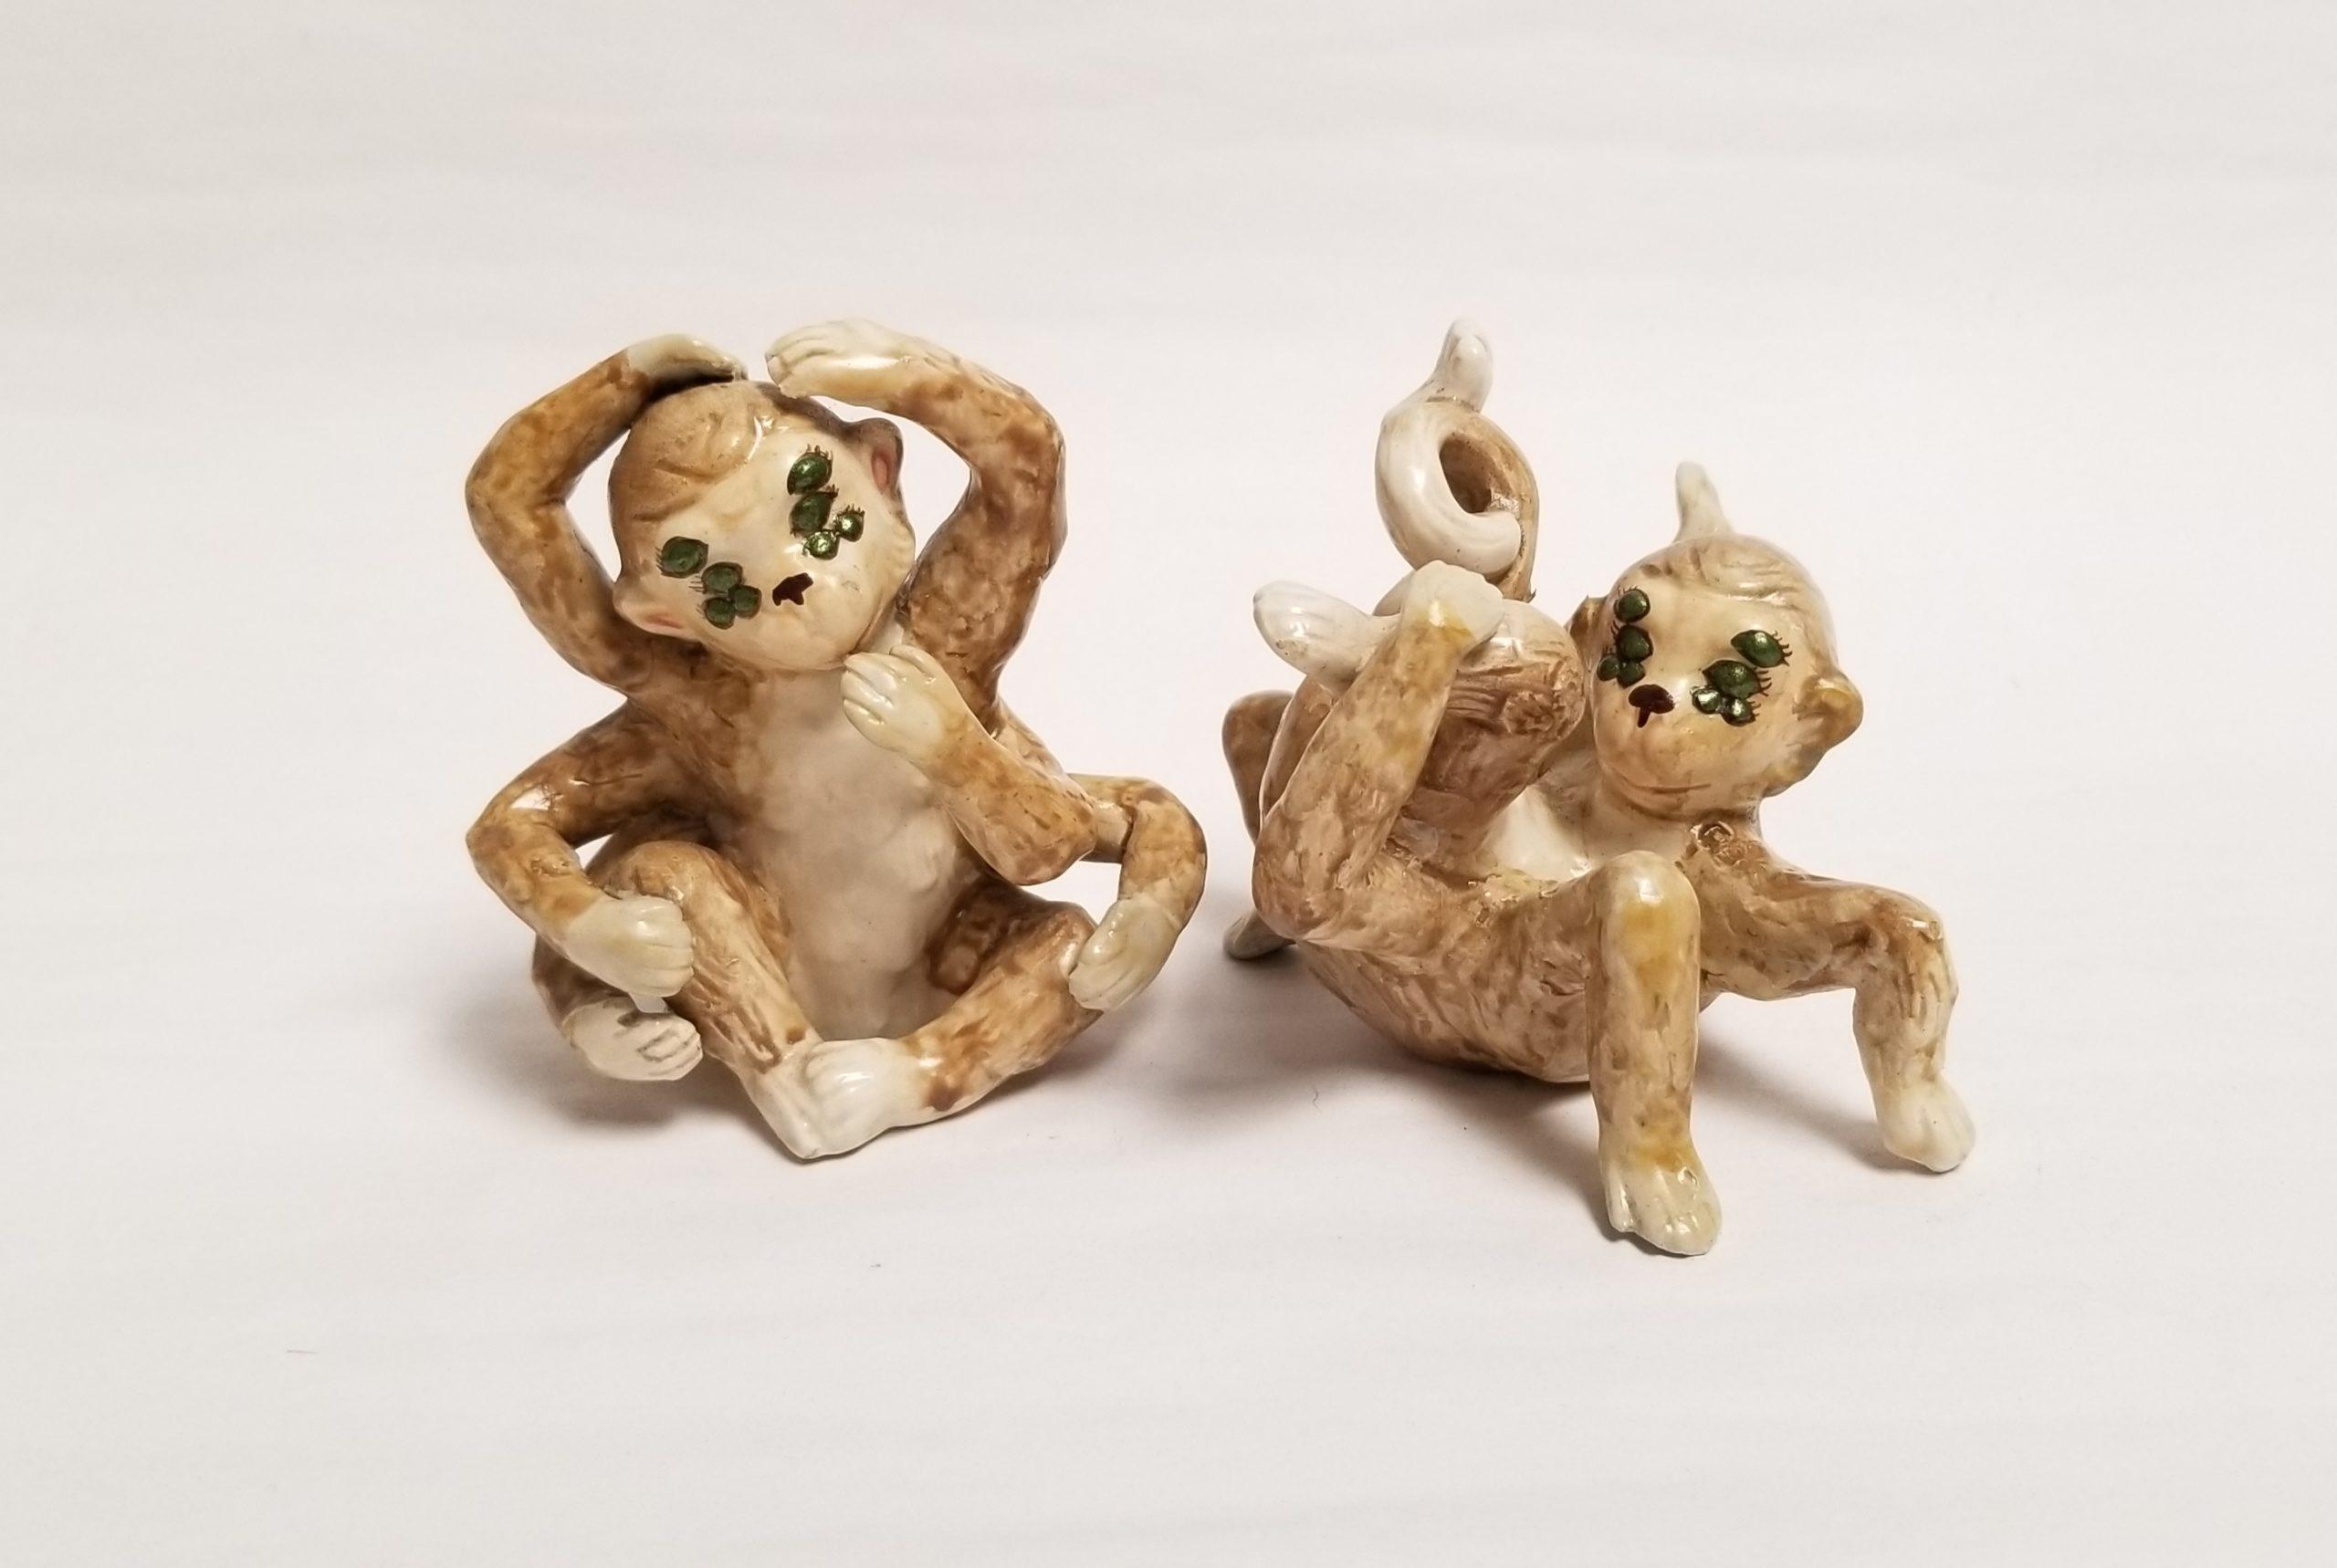 "Debra Broz, Spider Monkeys, 2021 Mixed media on secondhand ceramic figurines 3 ½"" x 3"" x 3"" and 3 ½"" x 4"" x 3 ½"""